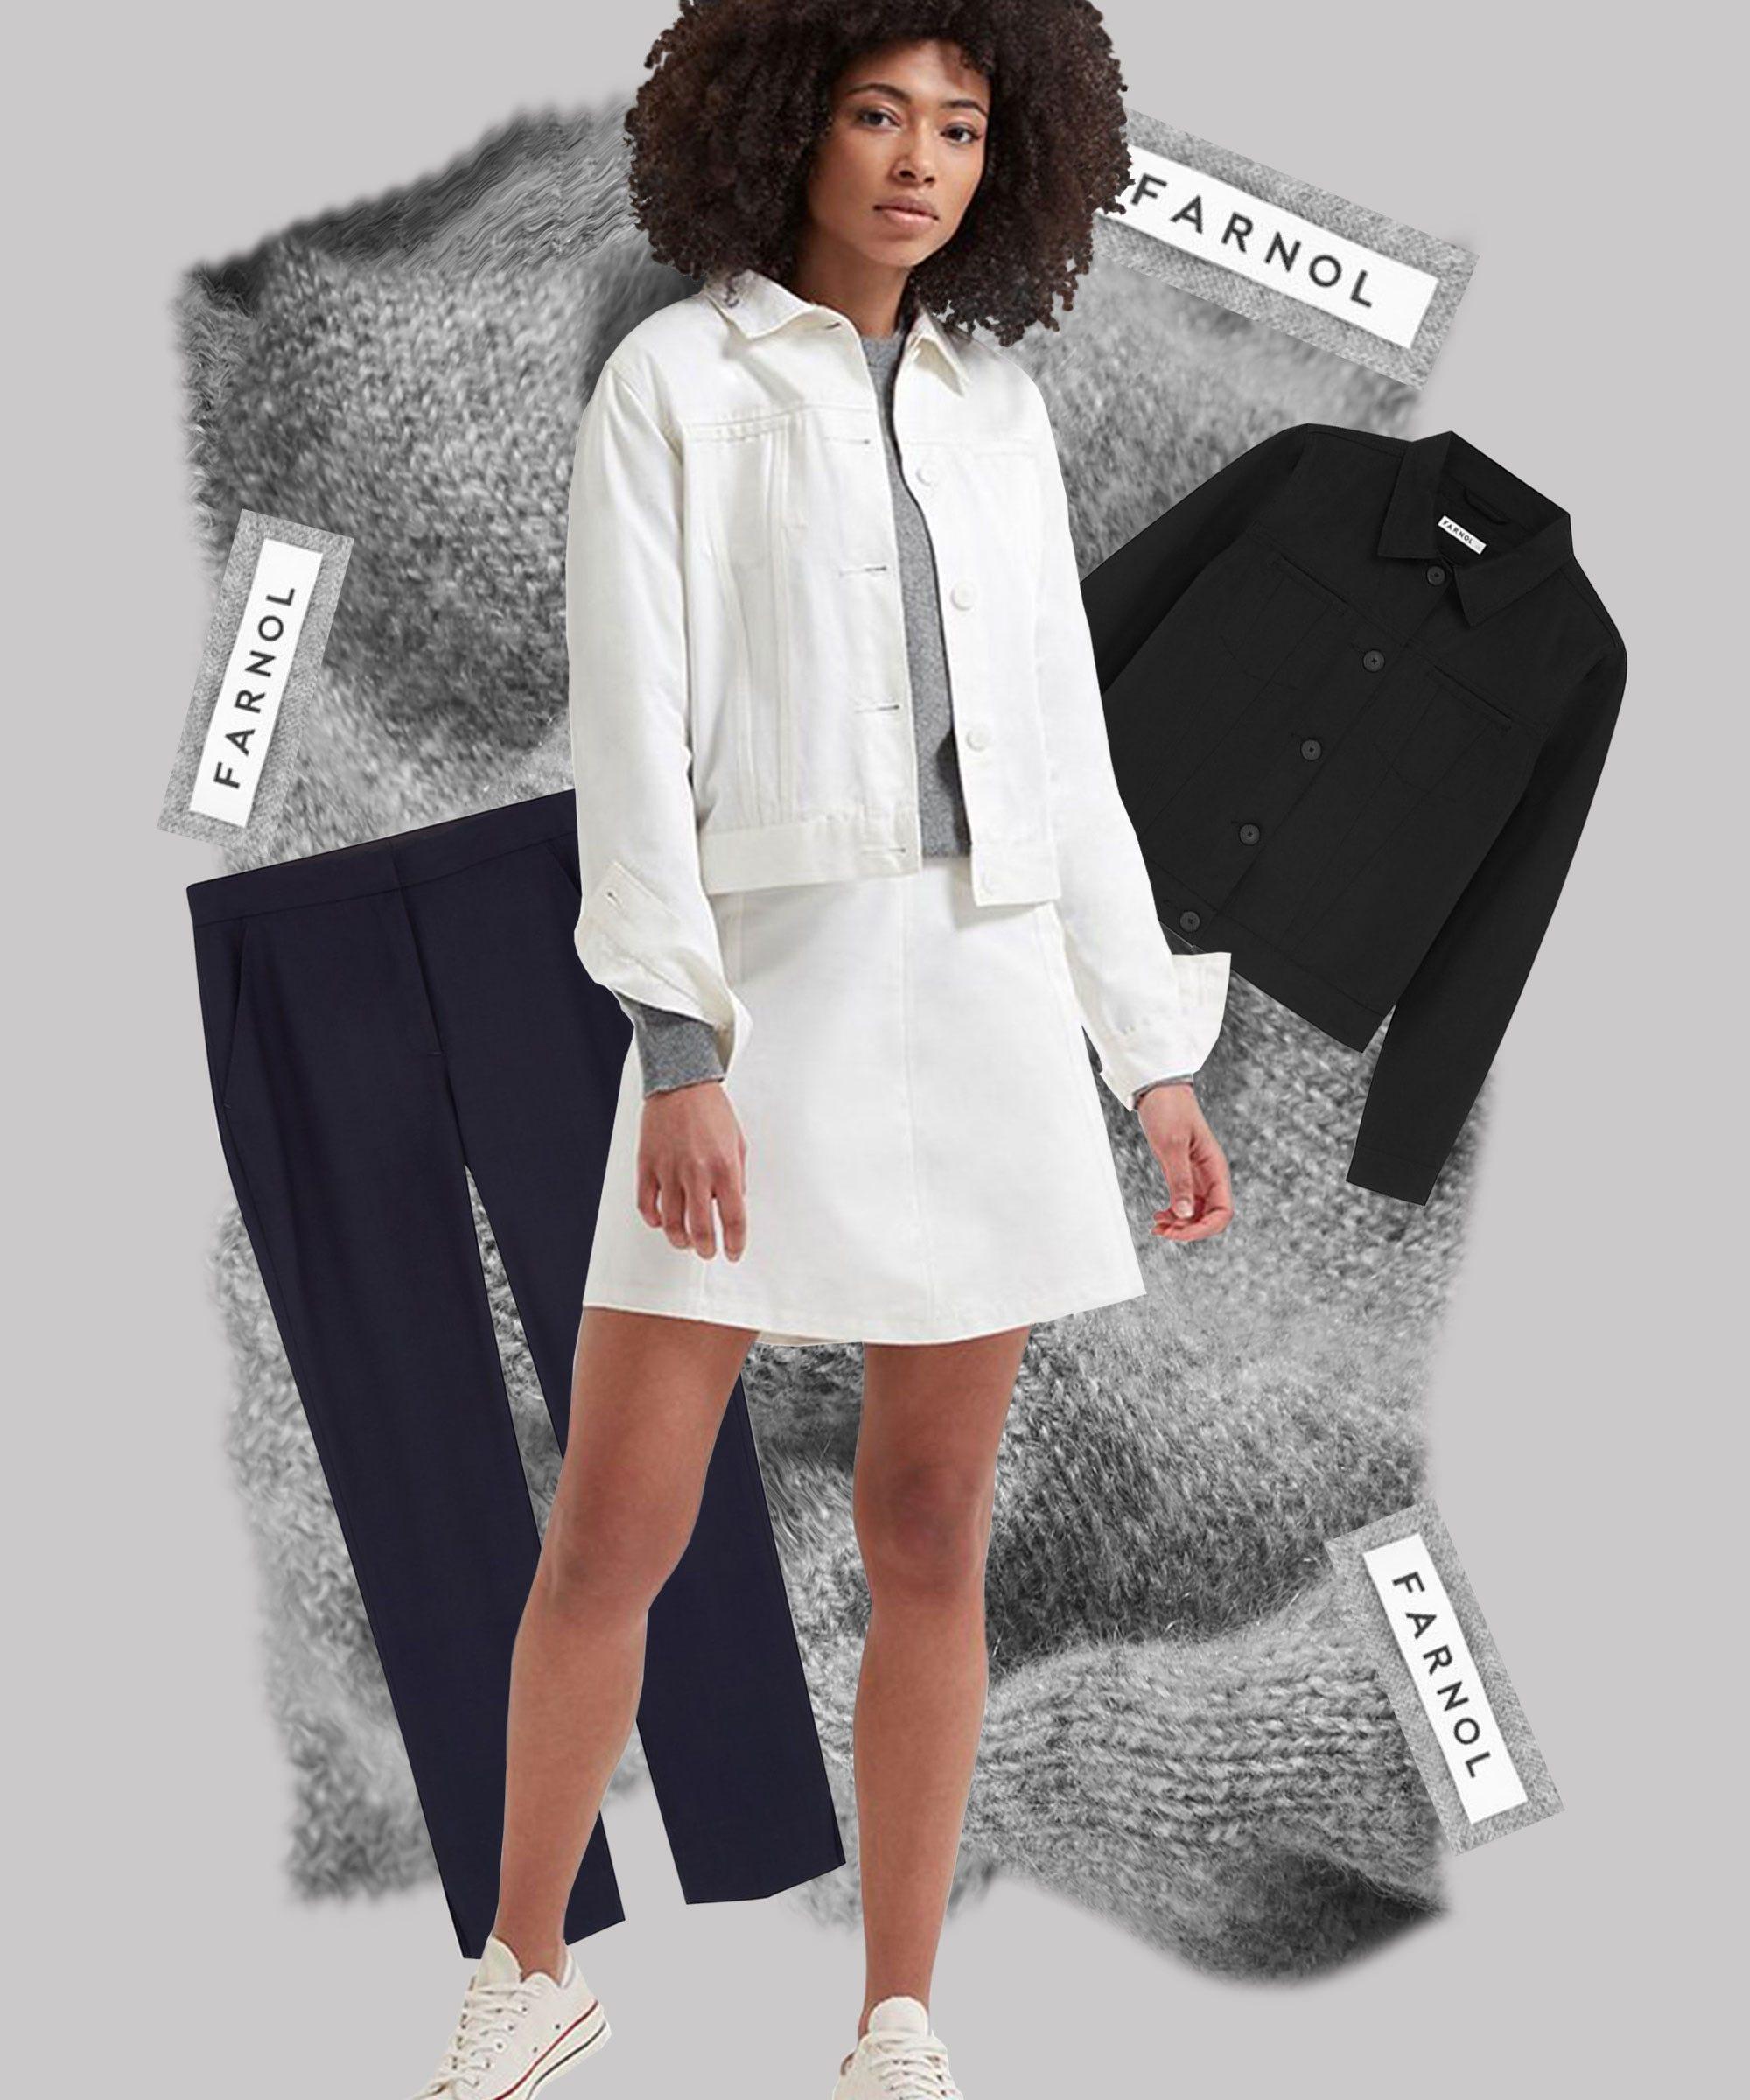 3b4d62d4 New Seasonless Slow Fashion Basics Brand Farnol